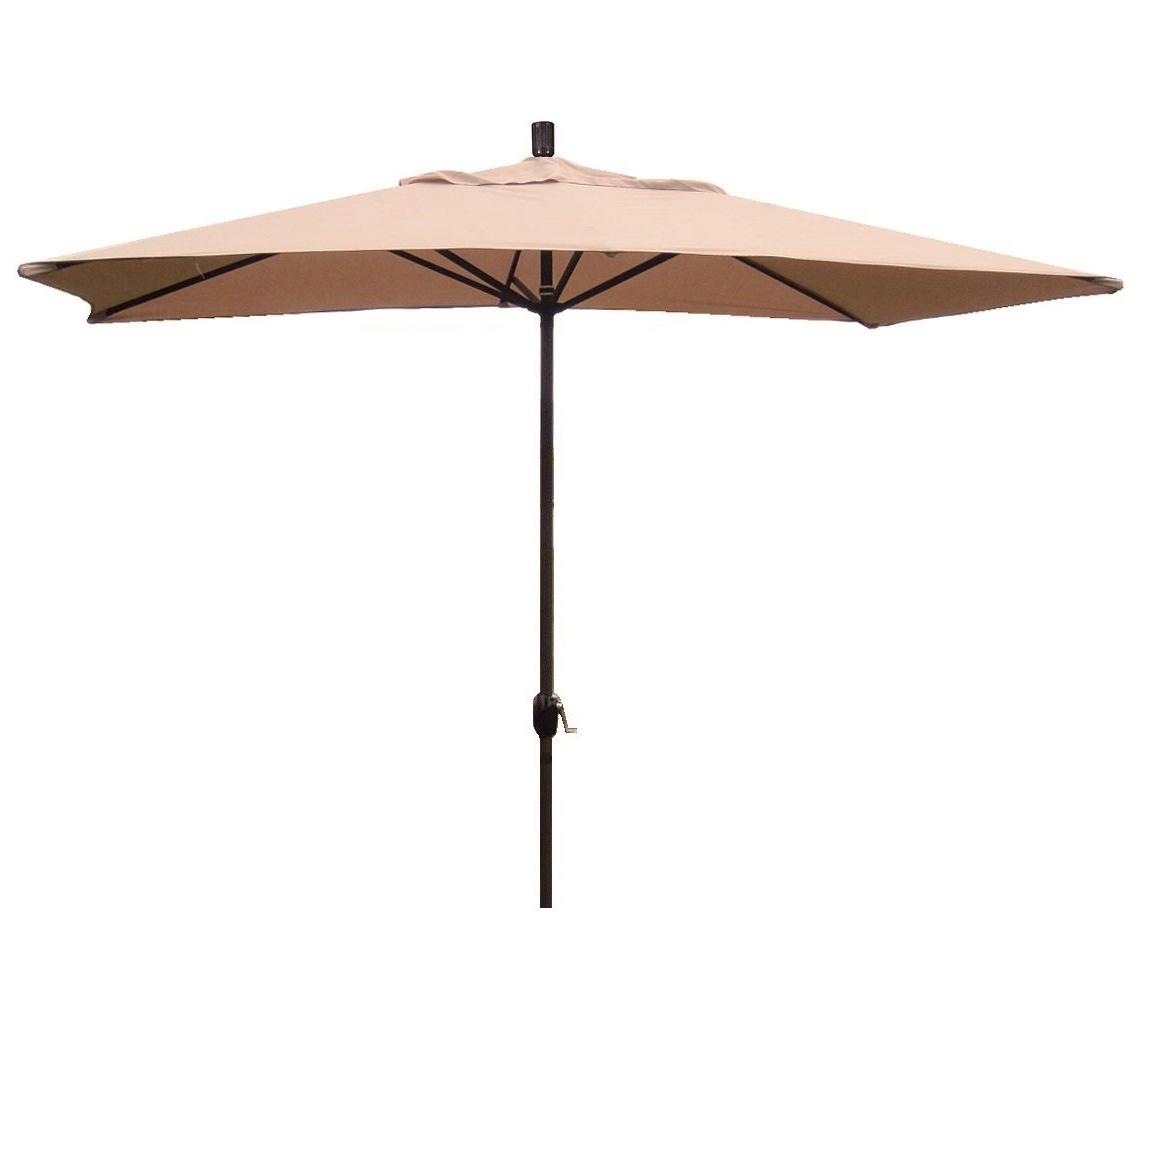 Dena Rectangular Market Umbrellas With Regard To Favorite Grieve 10' X 6' Rectangular Market Umbrella (View 5 of 20)